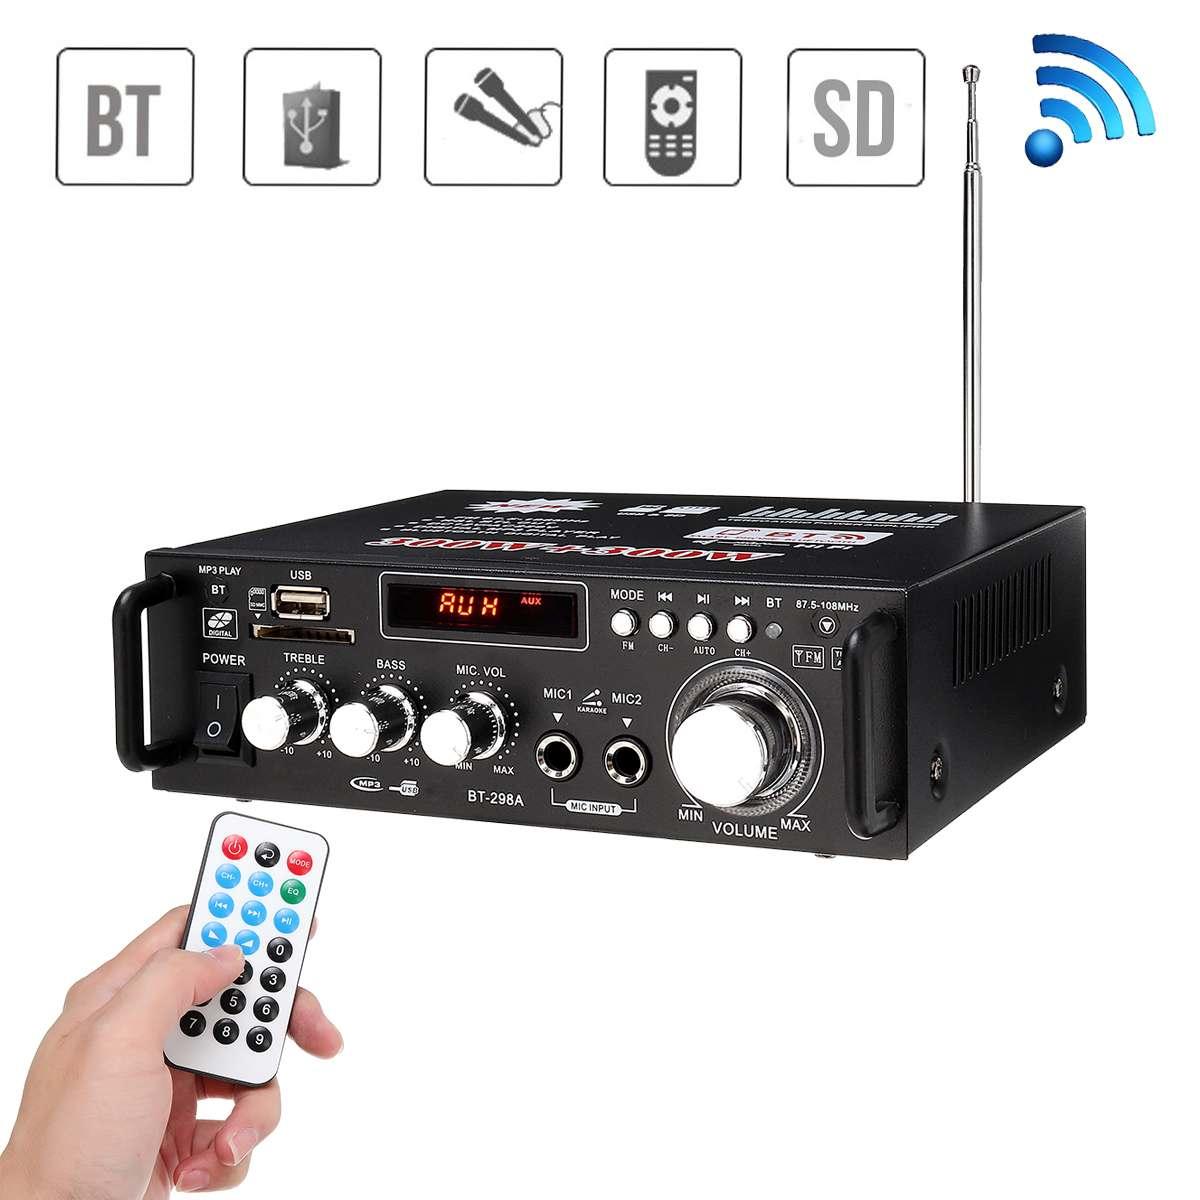 600w casa amplificadores de áudio bluetooth amplificador subwoofer amplificador sistema de som de cinema em casa mini amplificador profissional